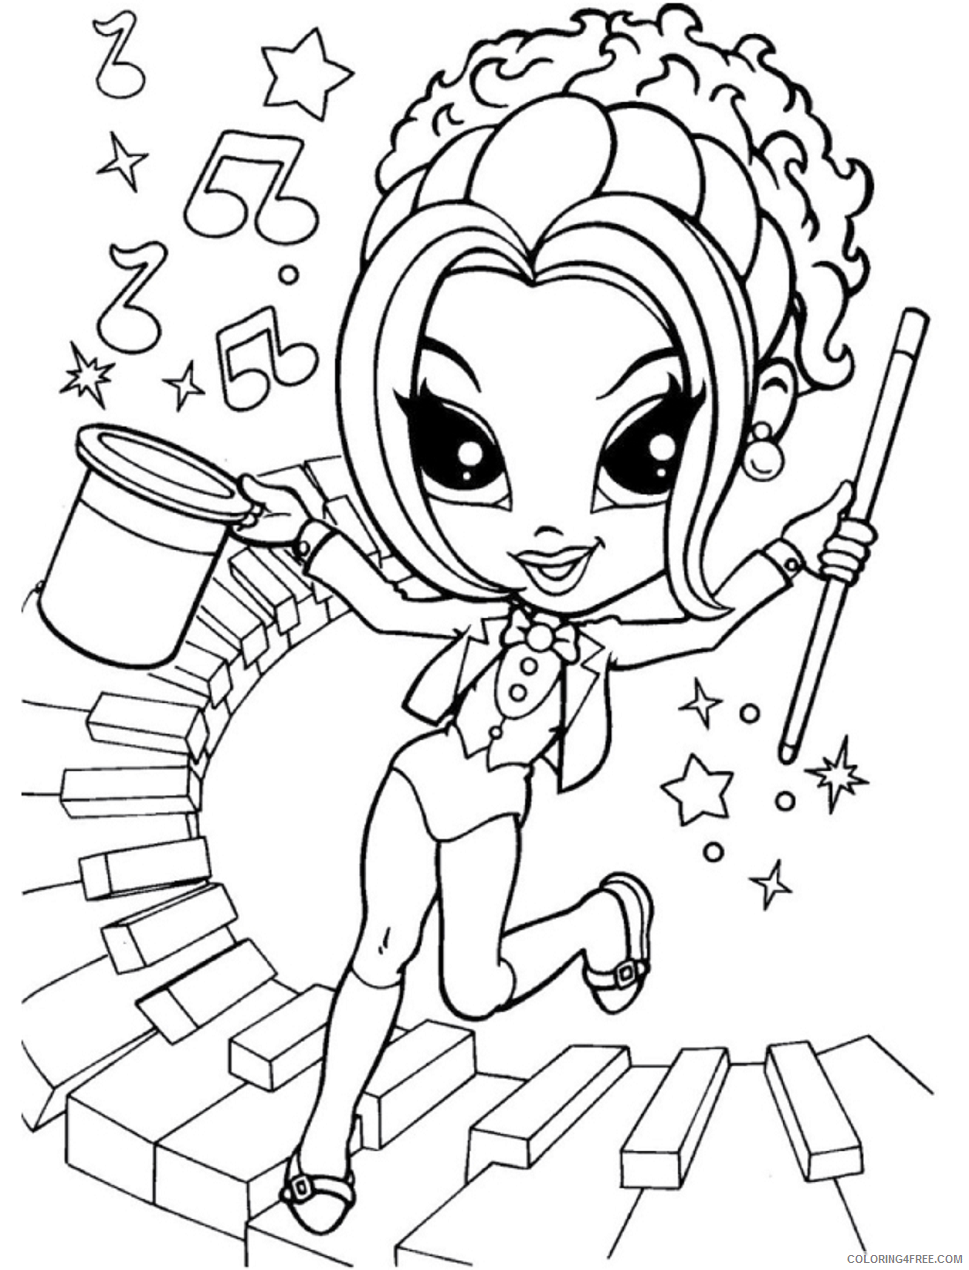 Lisa Frank Coloring Pages magician_lisa_frank Printable 2021 3881 Coloring4free